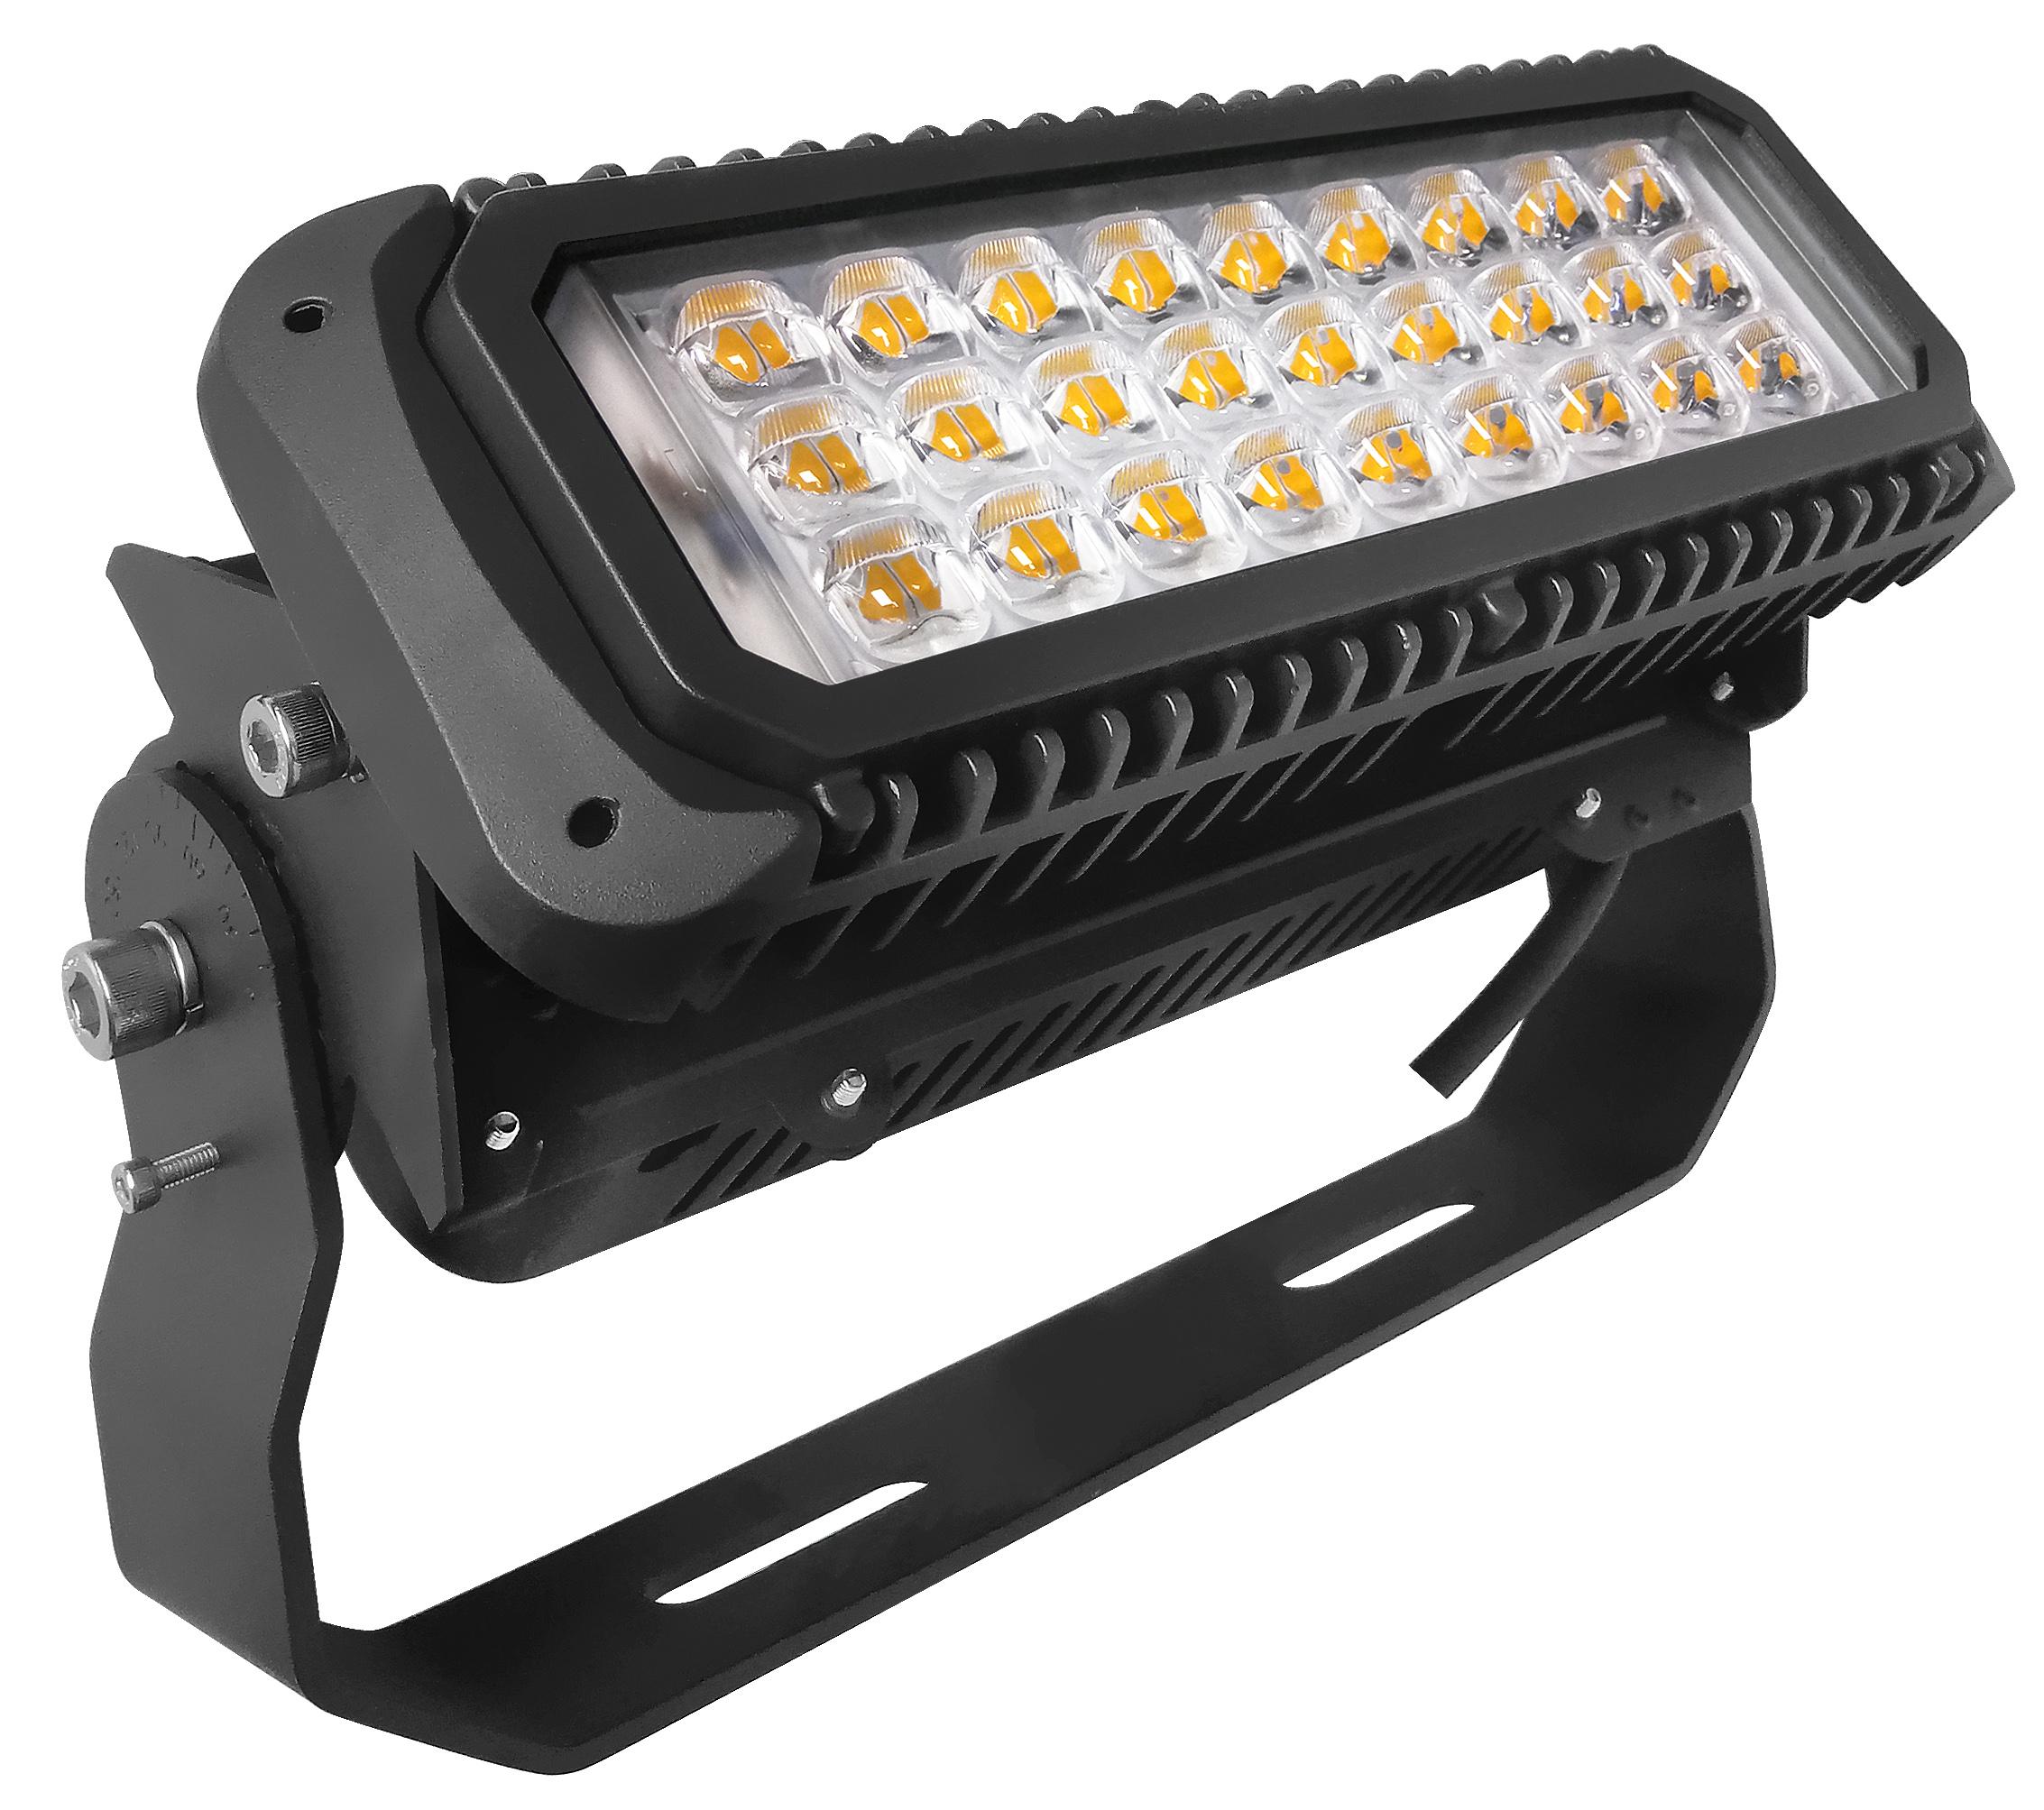 LED Fluter Maltos 75Watt mit asymmetrischen Abstrahlwinkel